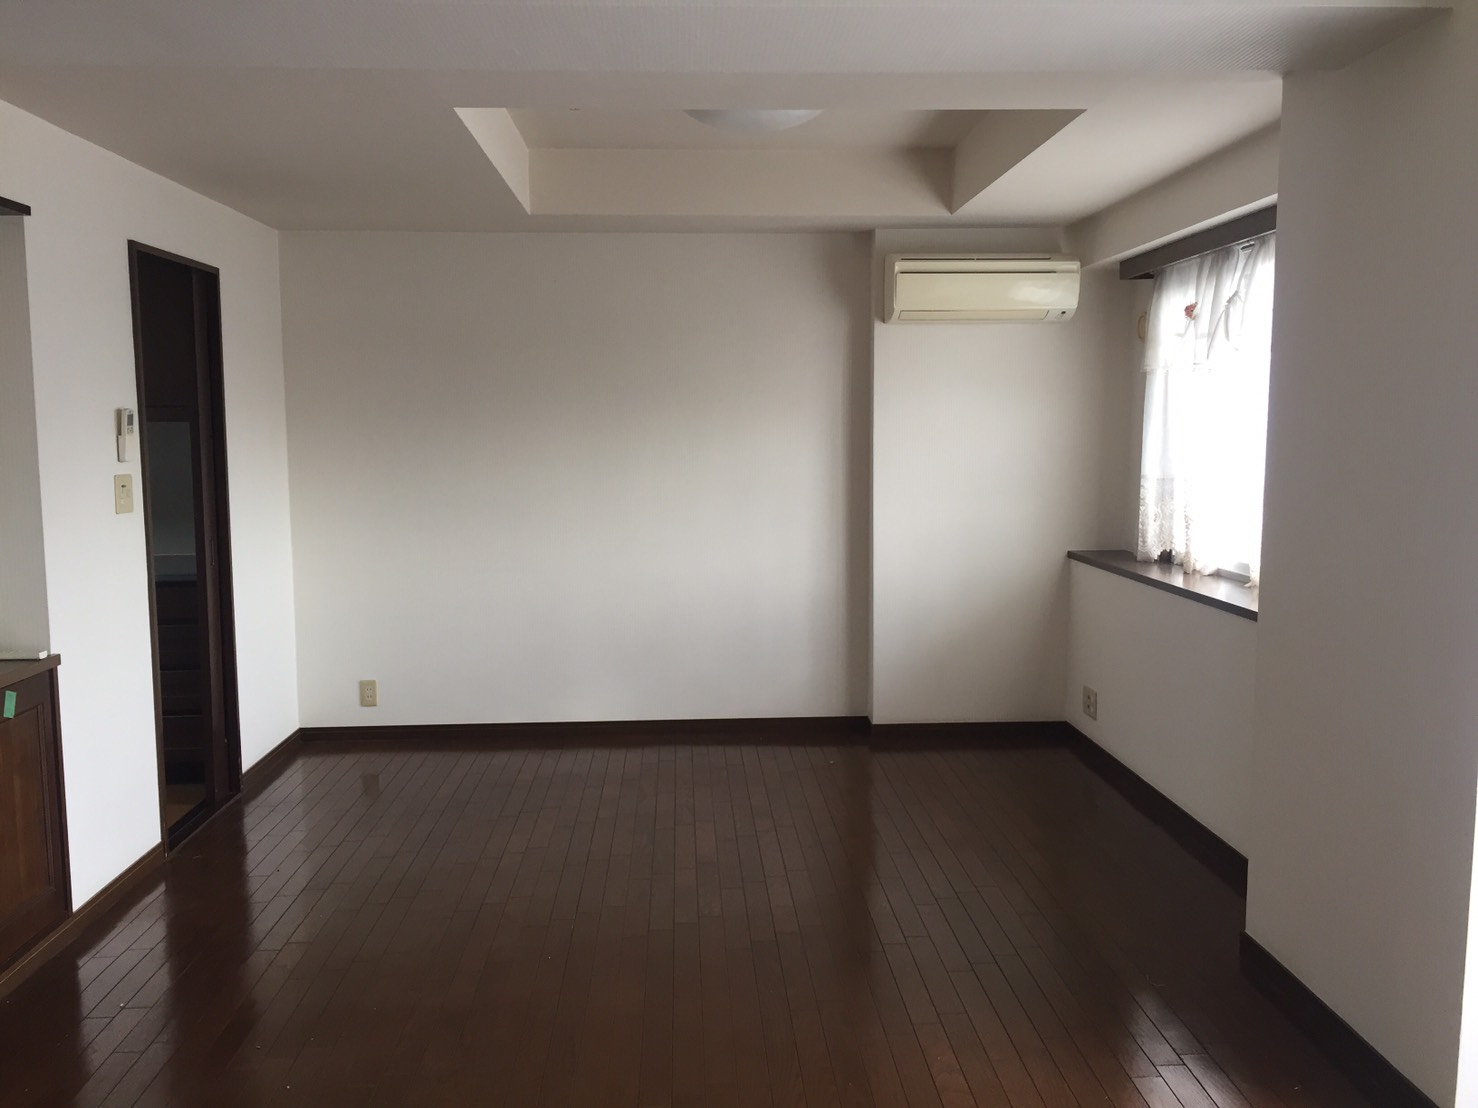 【 Before 01 】 リフォーム前のリビング 《 Asia Home 施工事例001 横浜市中区 3LDKマンション 》